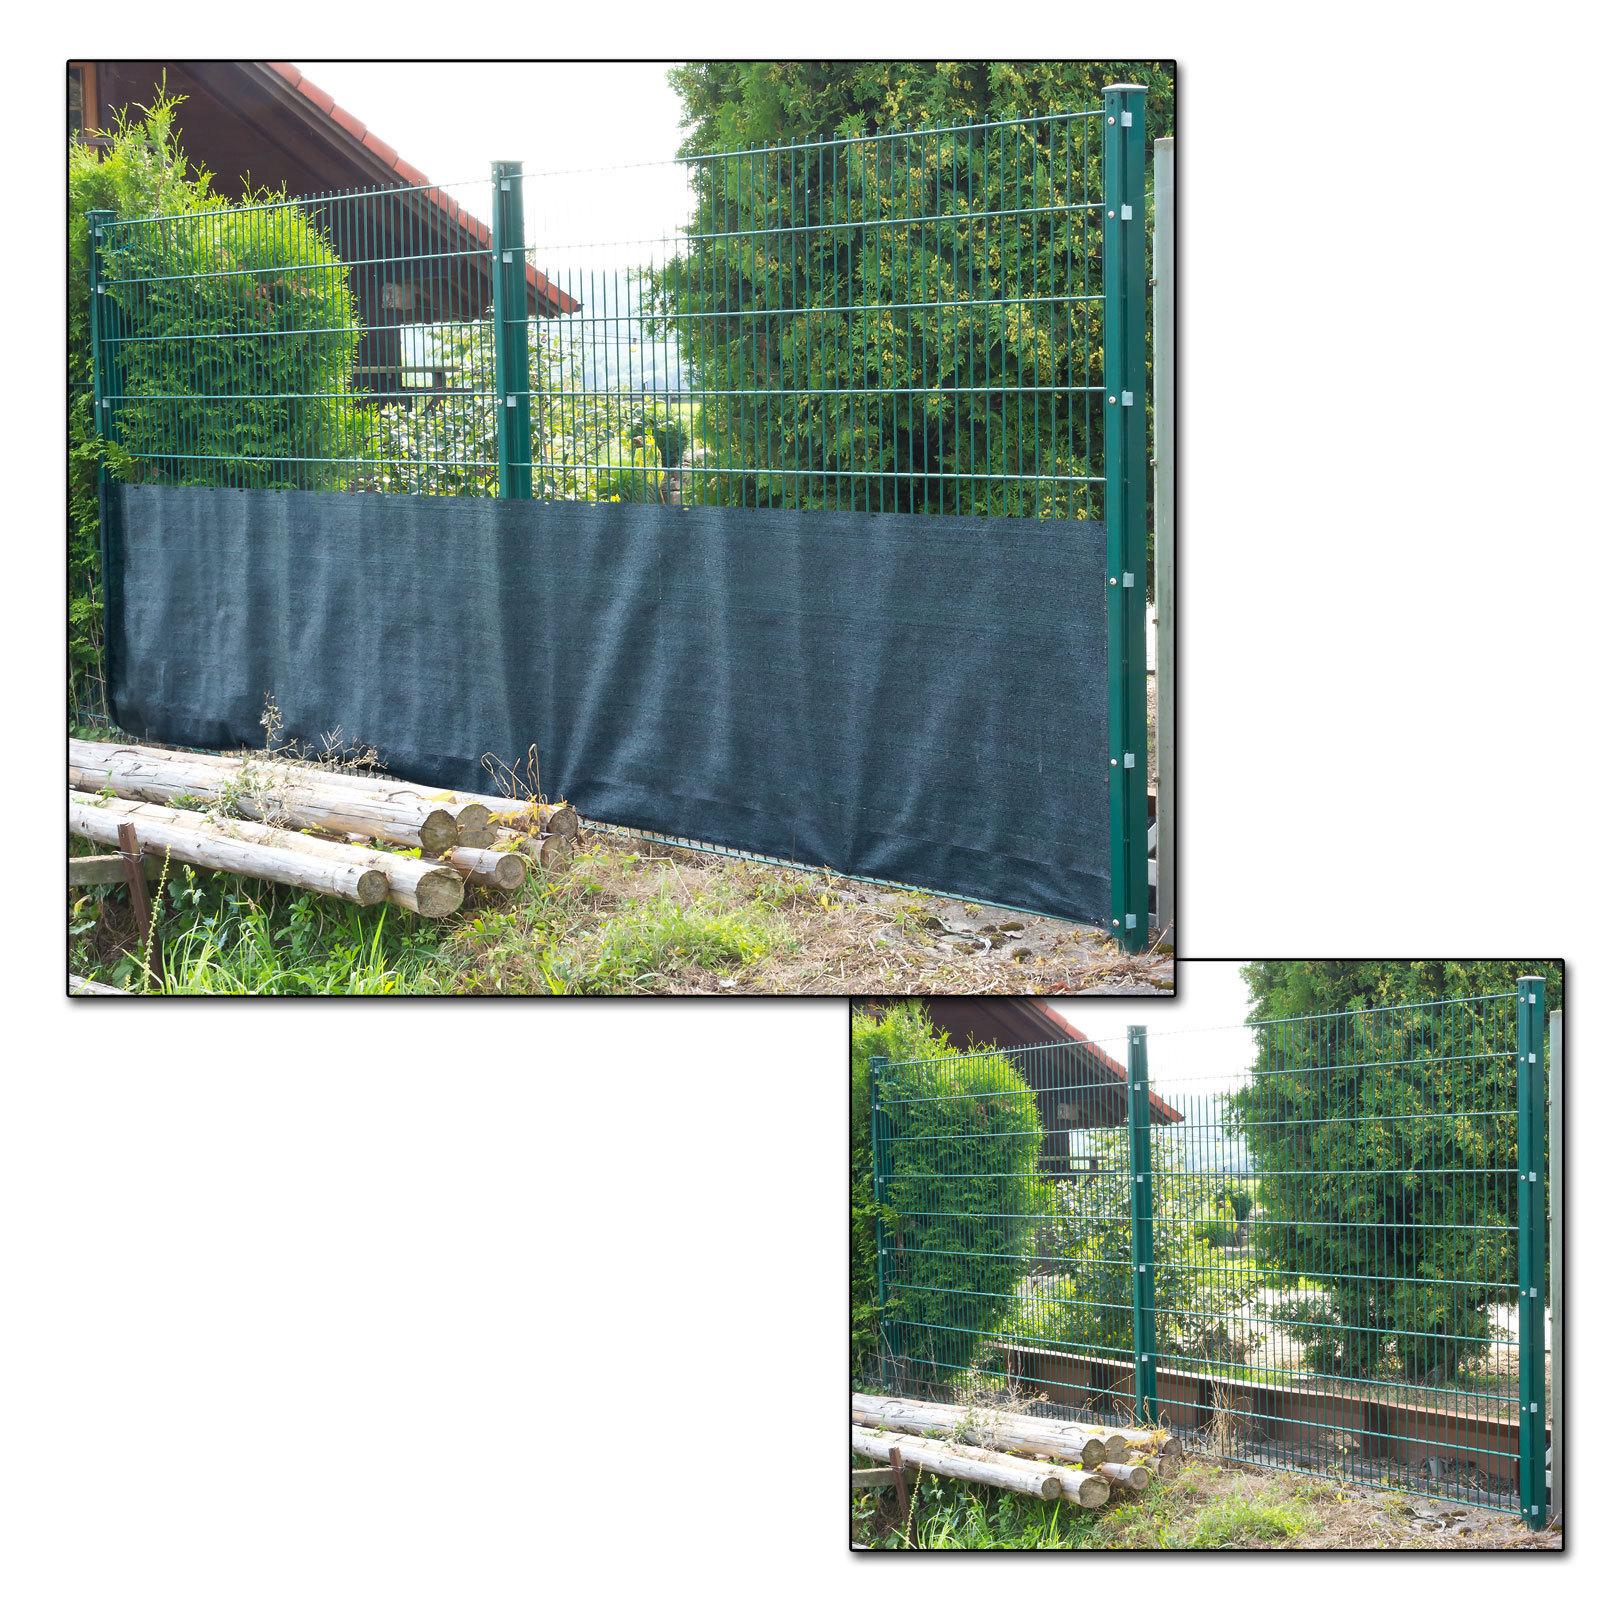 Sichtschutzzaun Gartenzaun Balkonsichtschutz Terrasse Zaun 25 x 1 m dunkelgrün